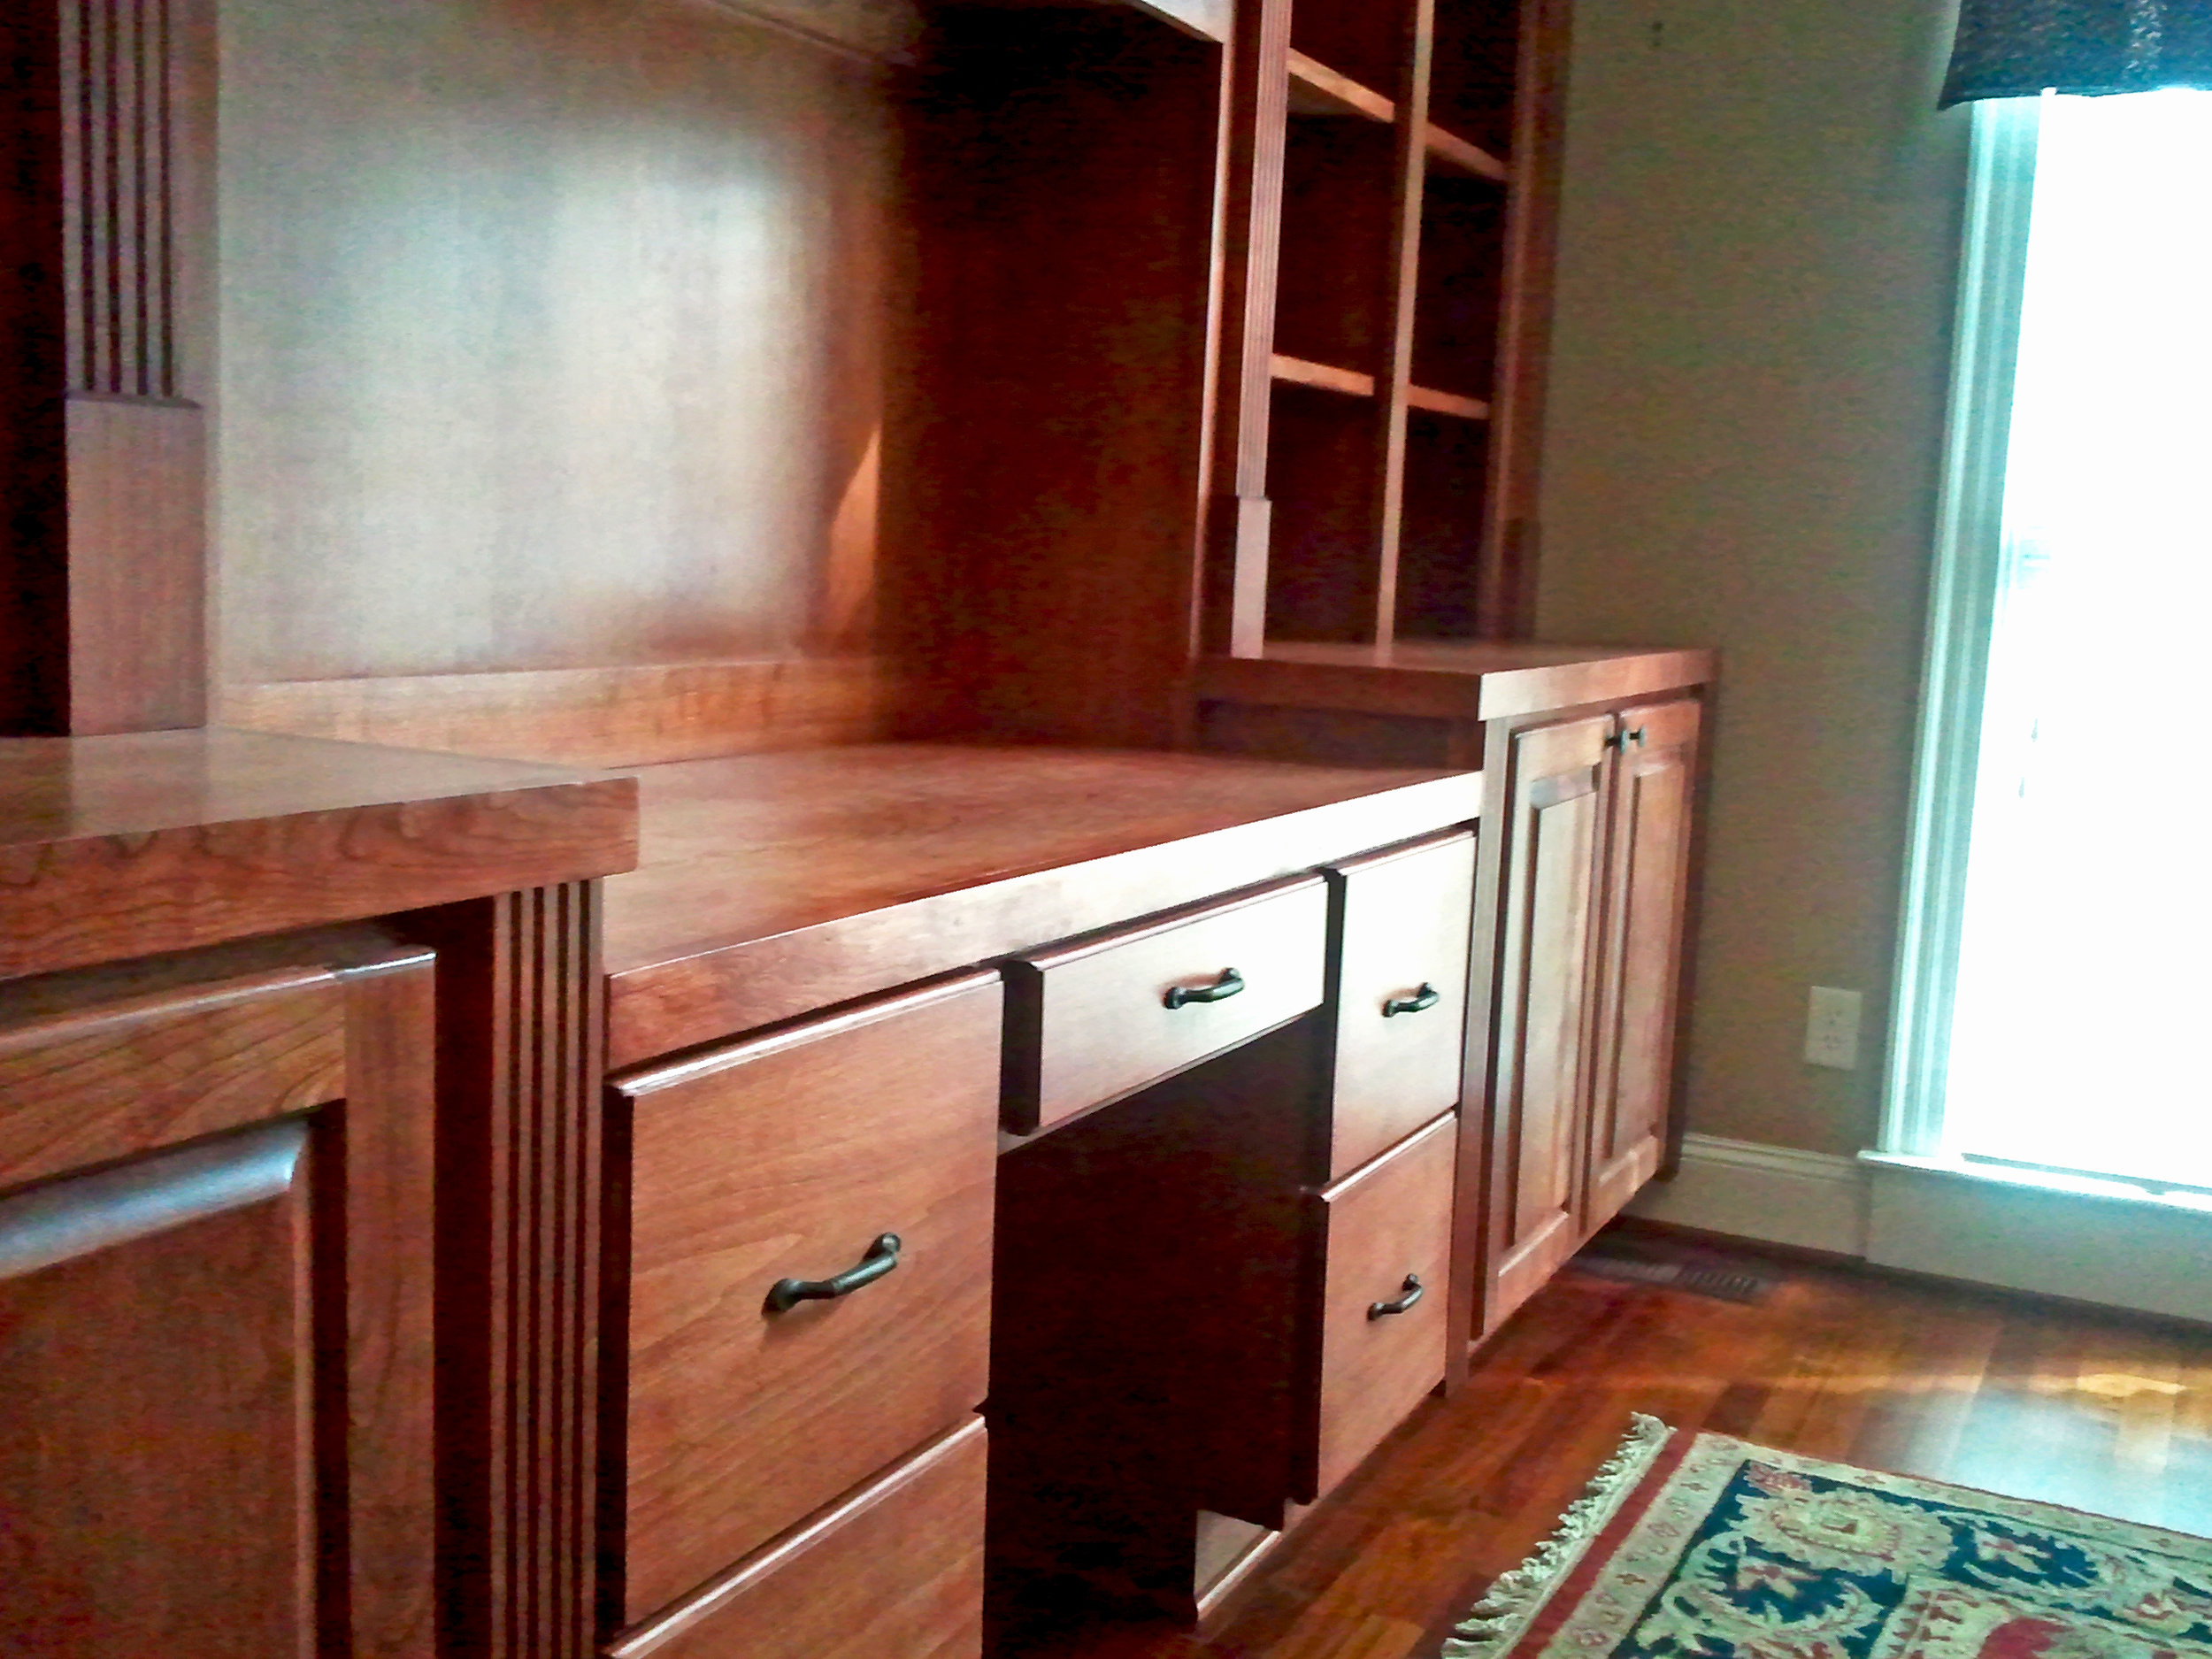 Cherry Desk with Fluting Detail, Raised Panel Doors, Filing Drawers & Pen Drawer